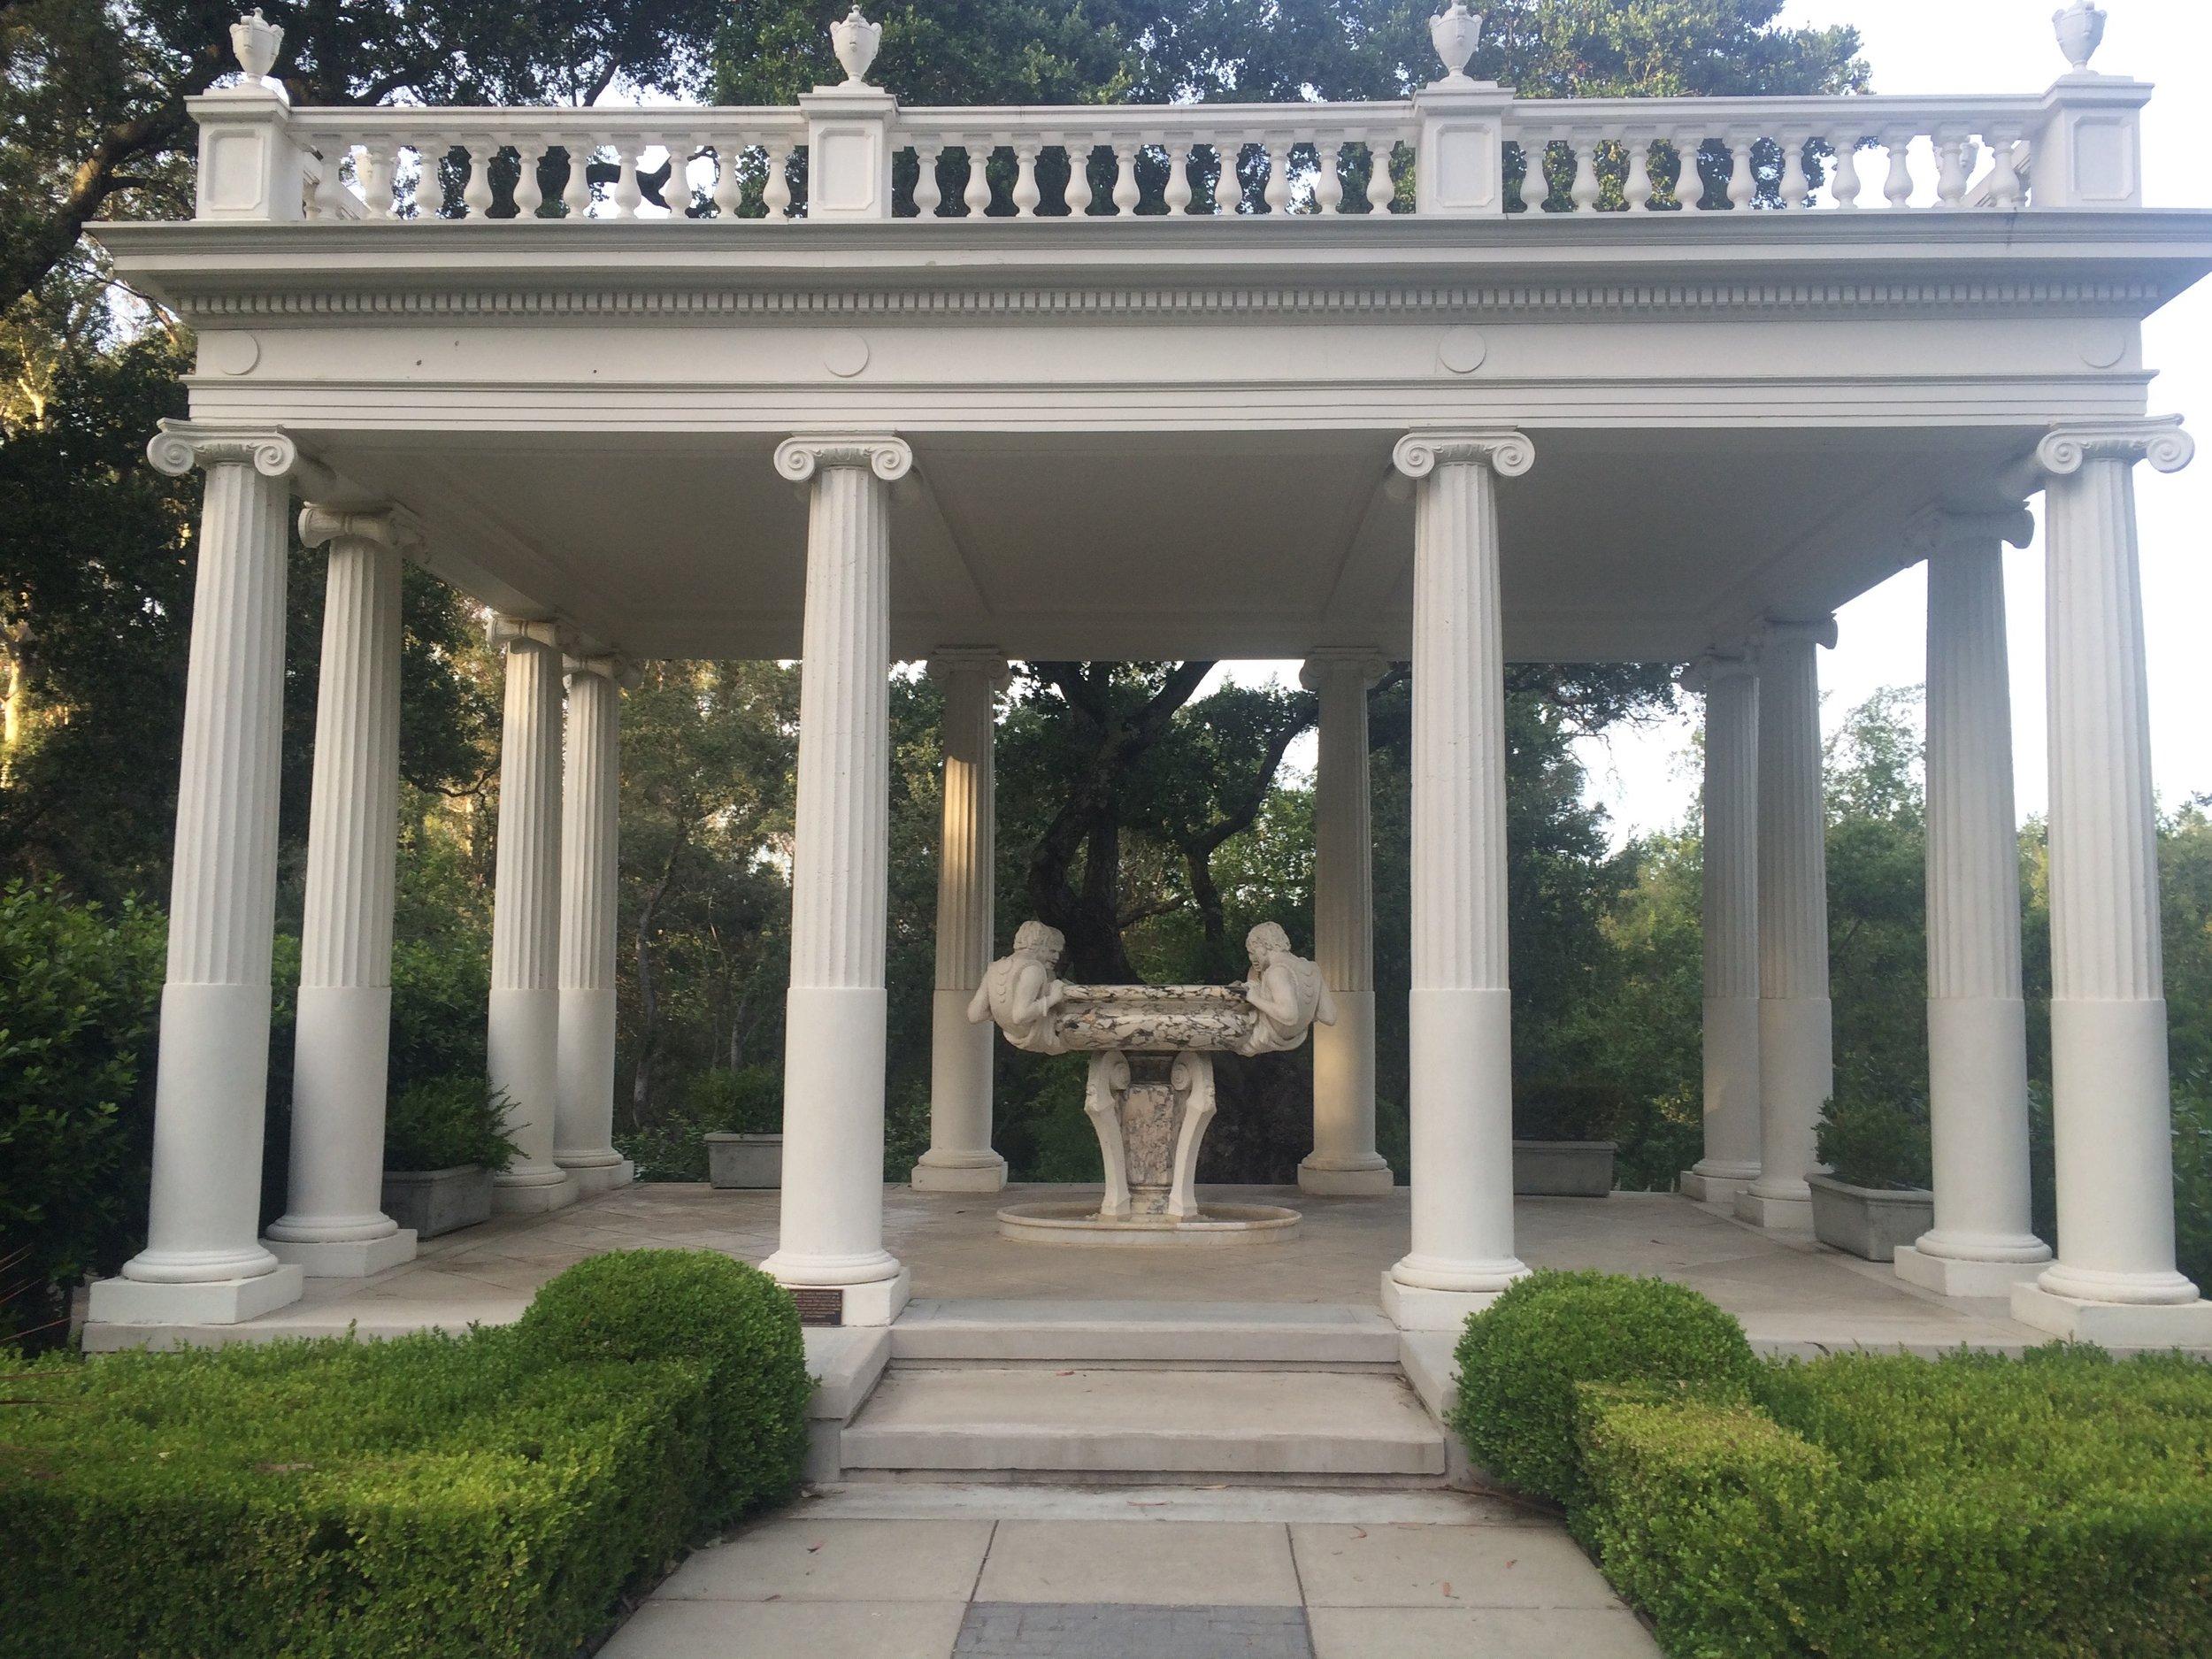 Temple of Love, Italianate Garden - Photo by Ava Roy